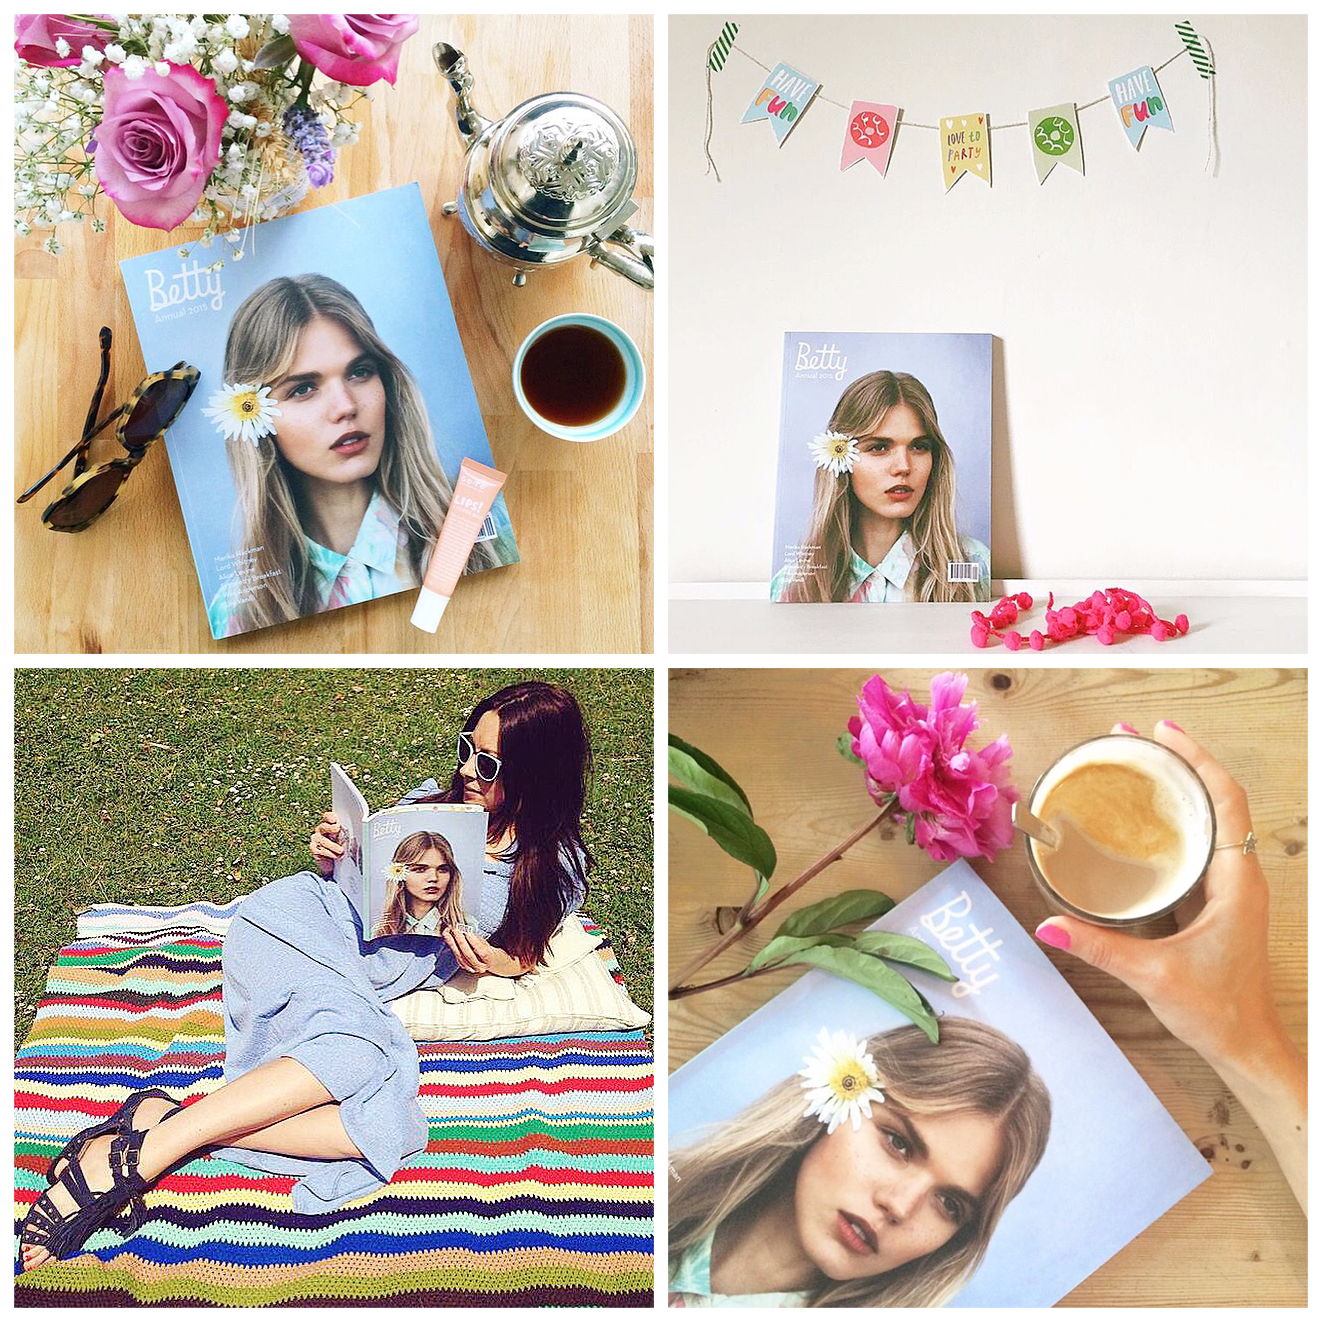 Betty-Magazine-Instagram-Favourites.jpeg